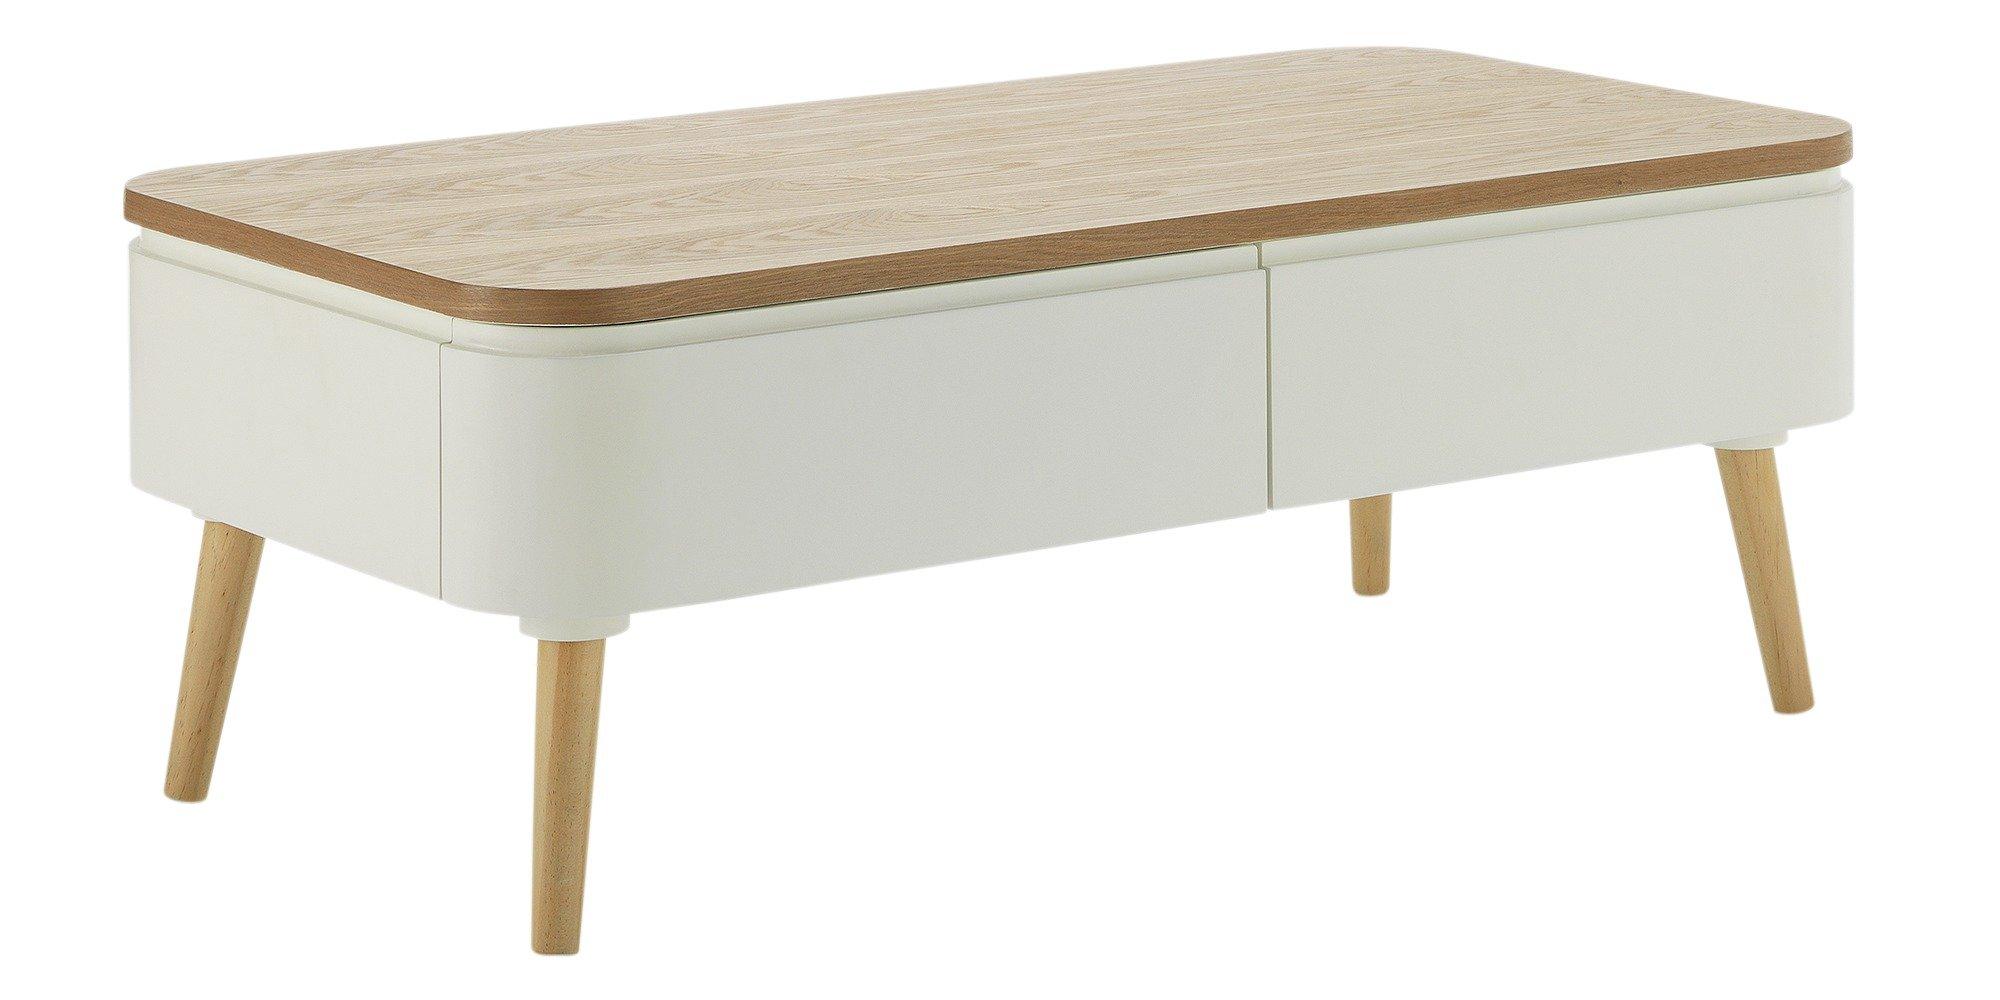 buy hygena reese round corner 2 drawer coffee table at argos.co.uk